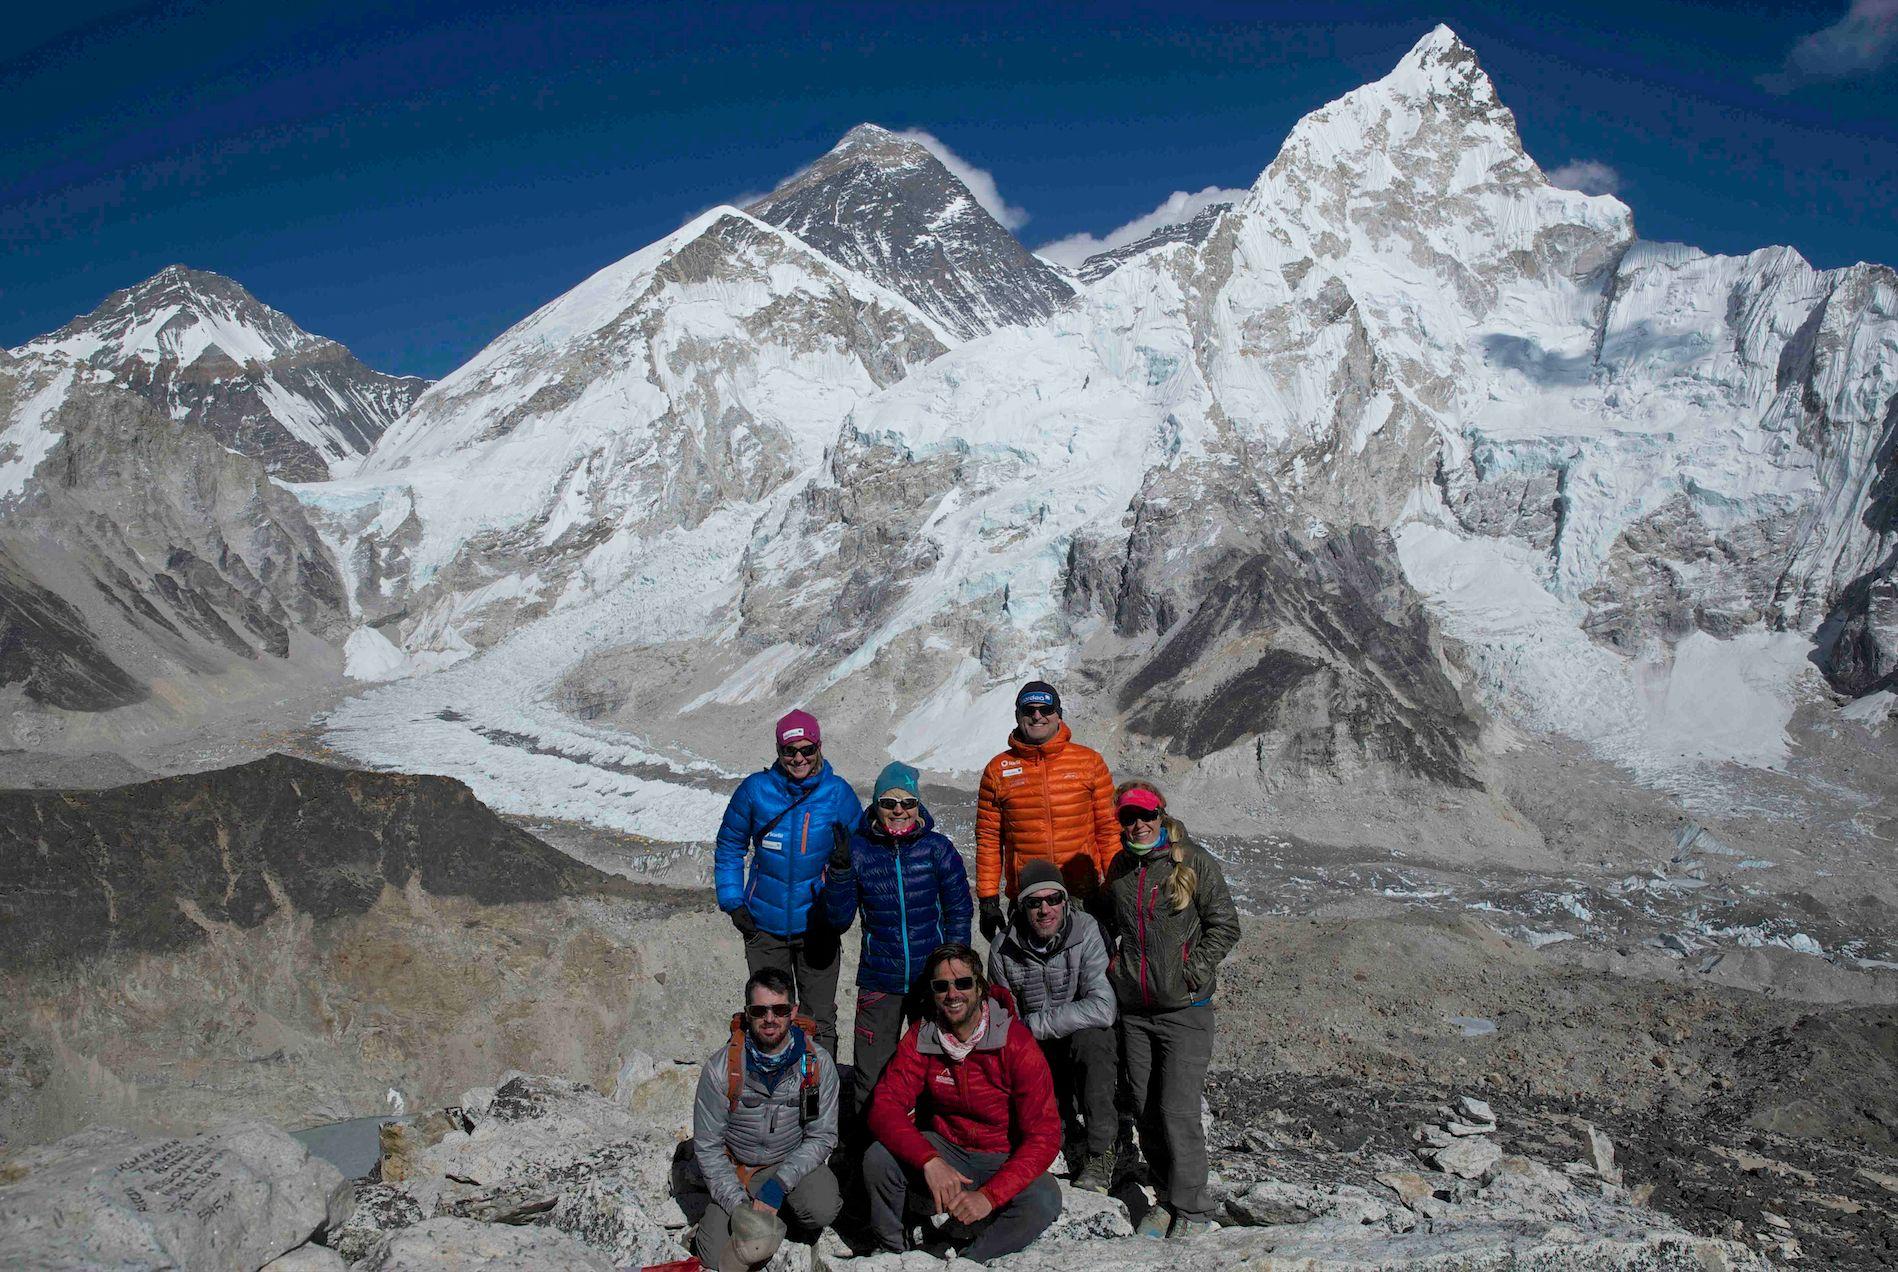 Mountain Professionals: Everest Summit Push On